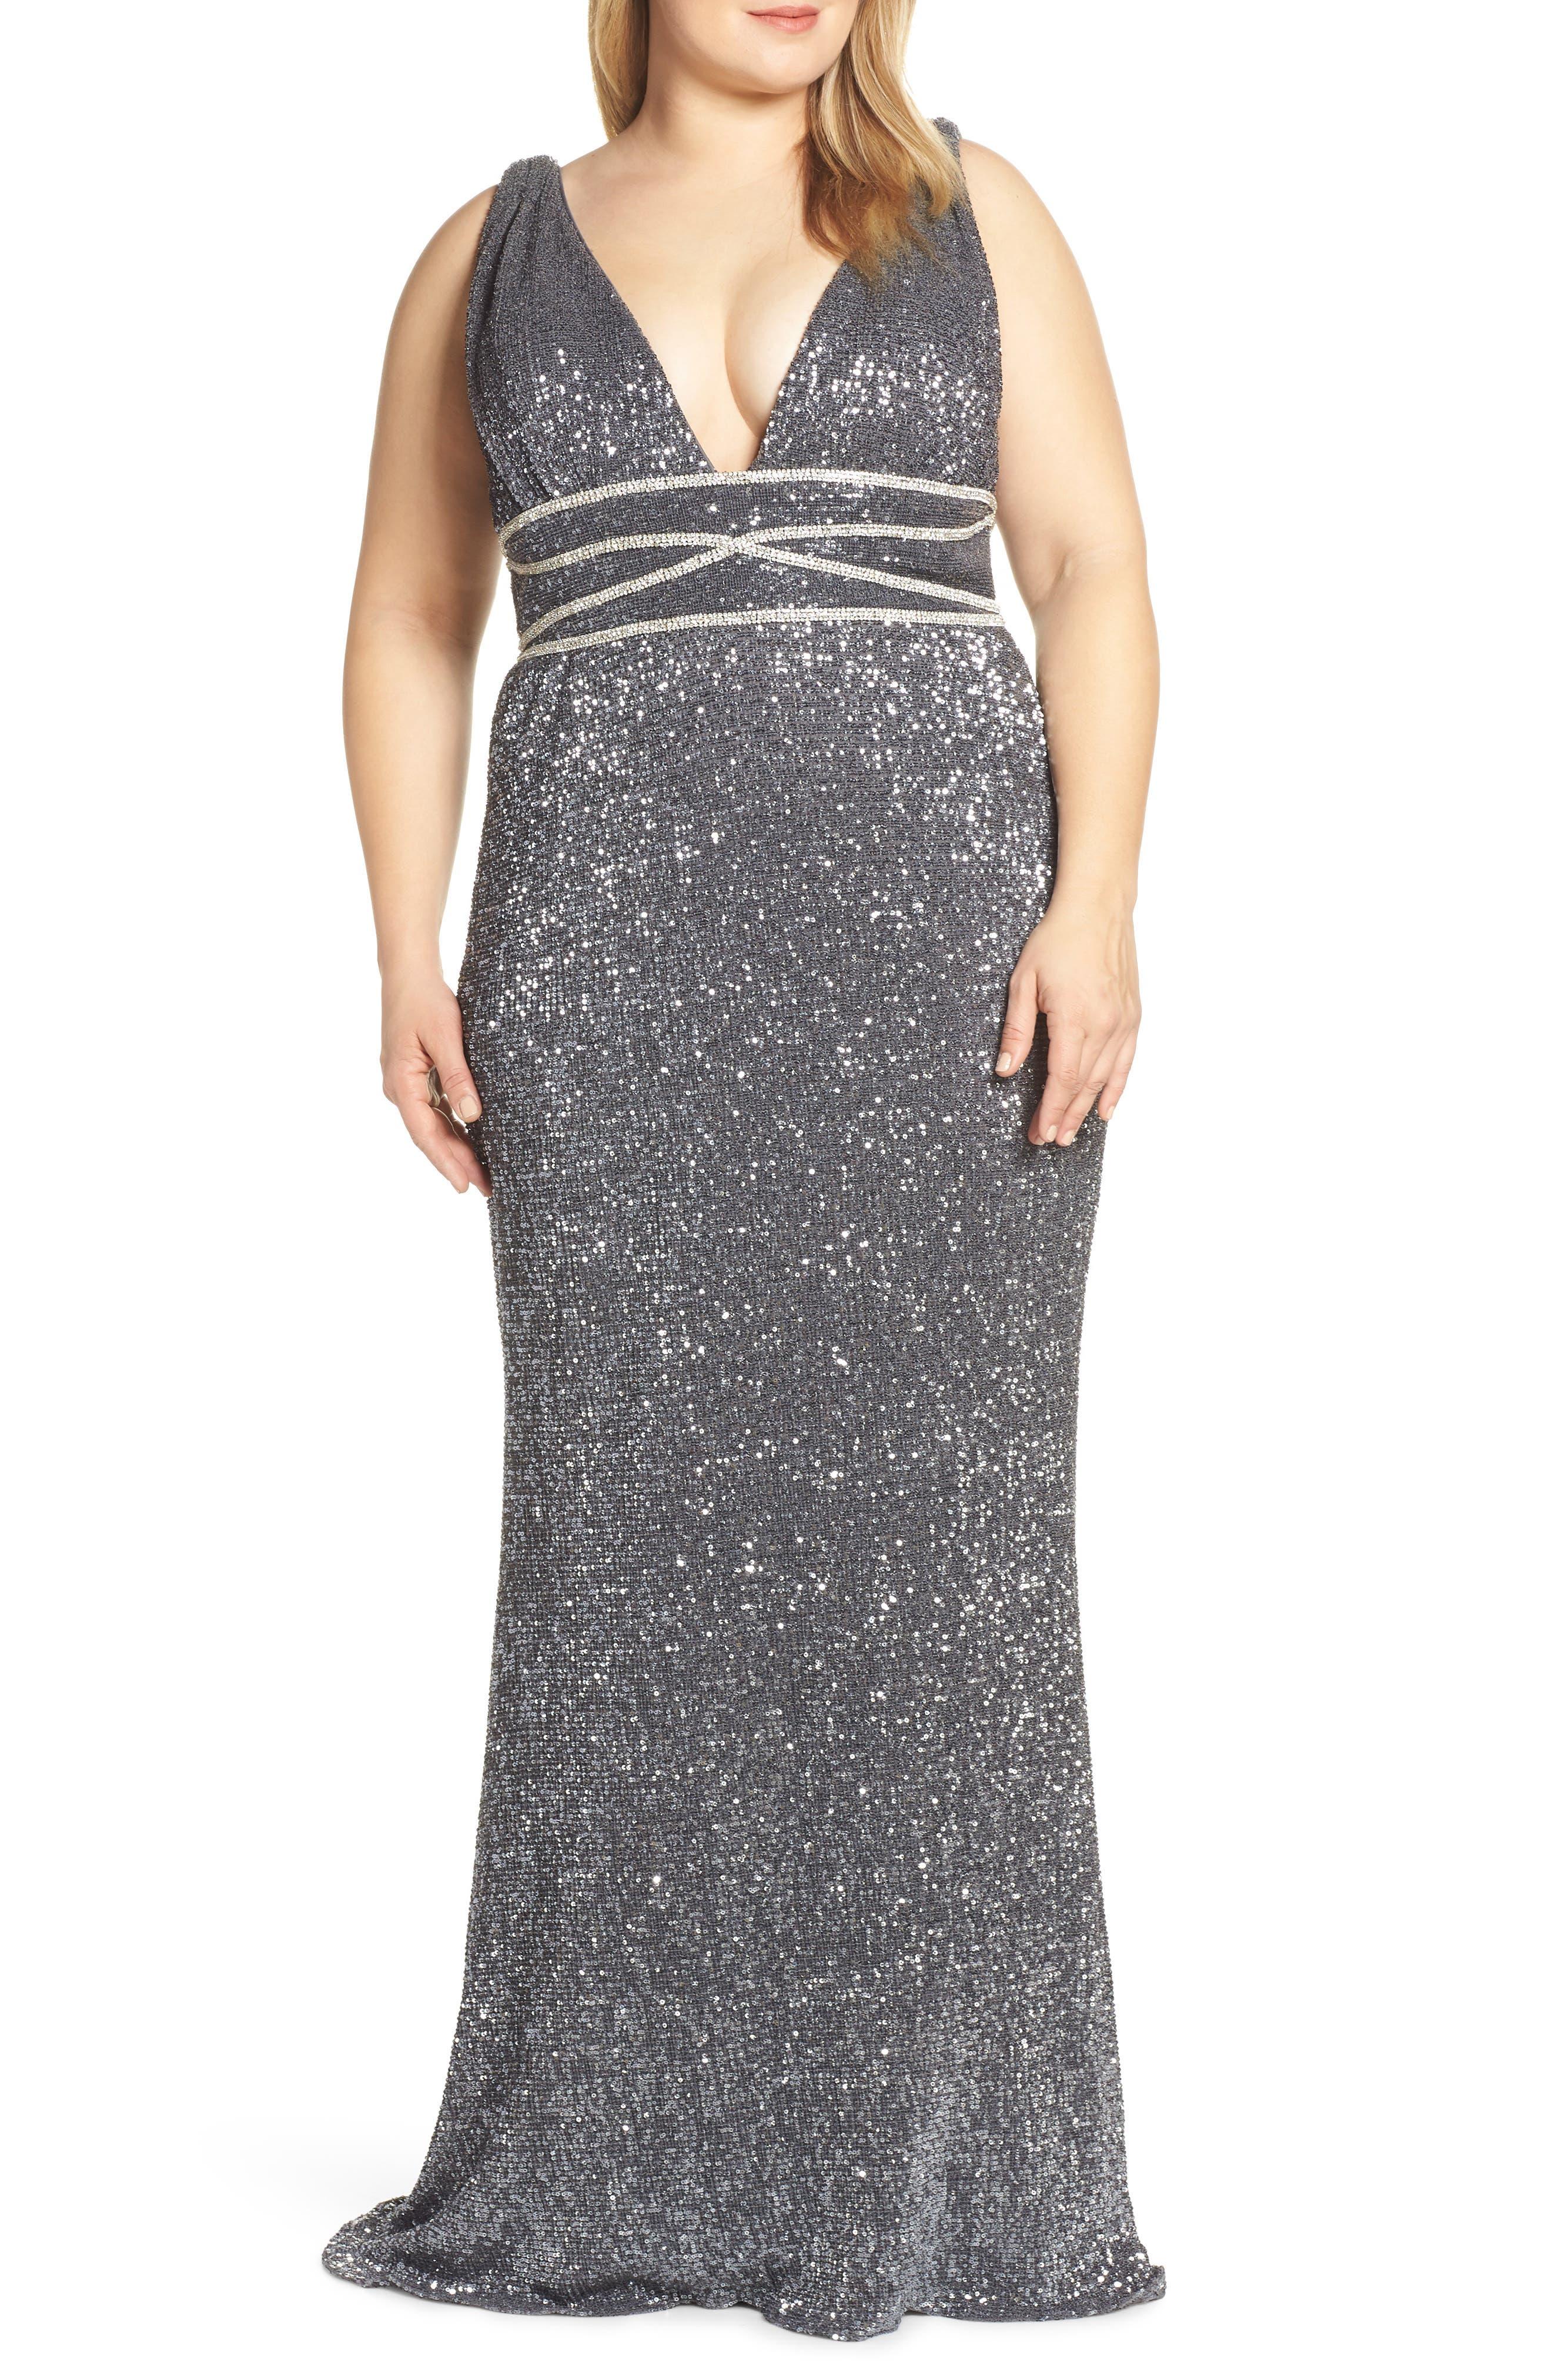 Plus Size MAC Duggal Beaded Waist Sequin Evening Dress, Grey